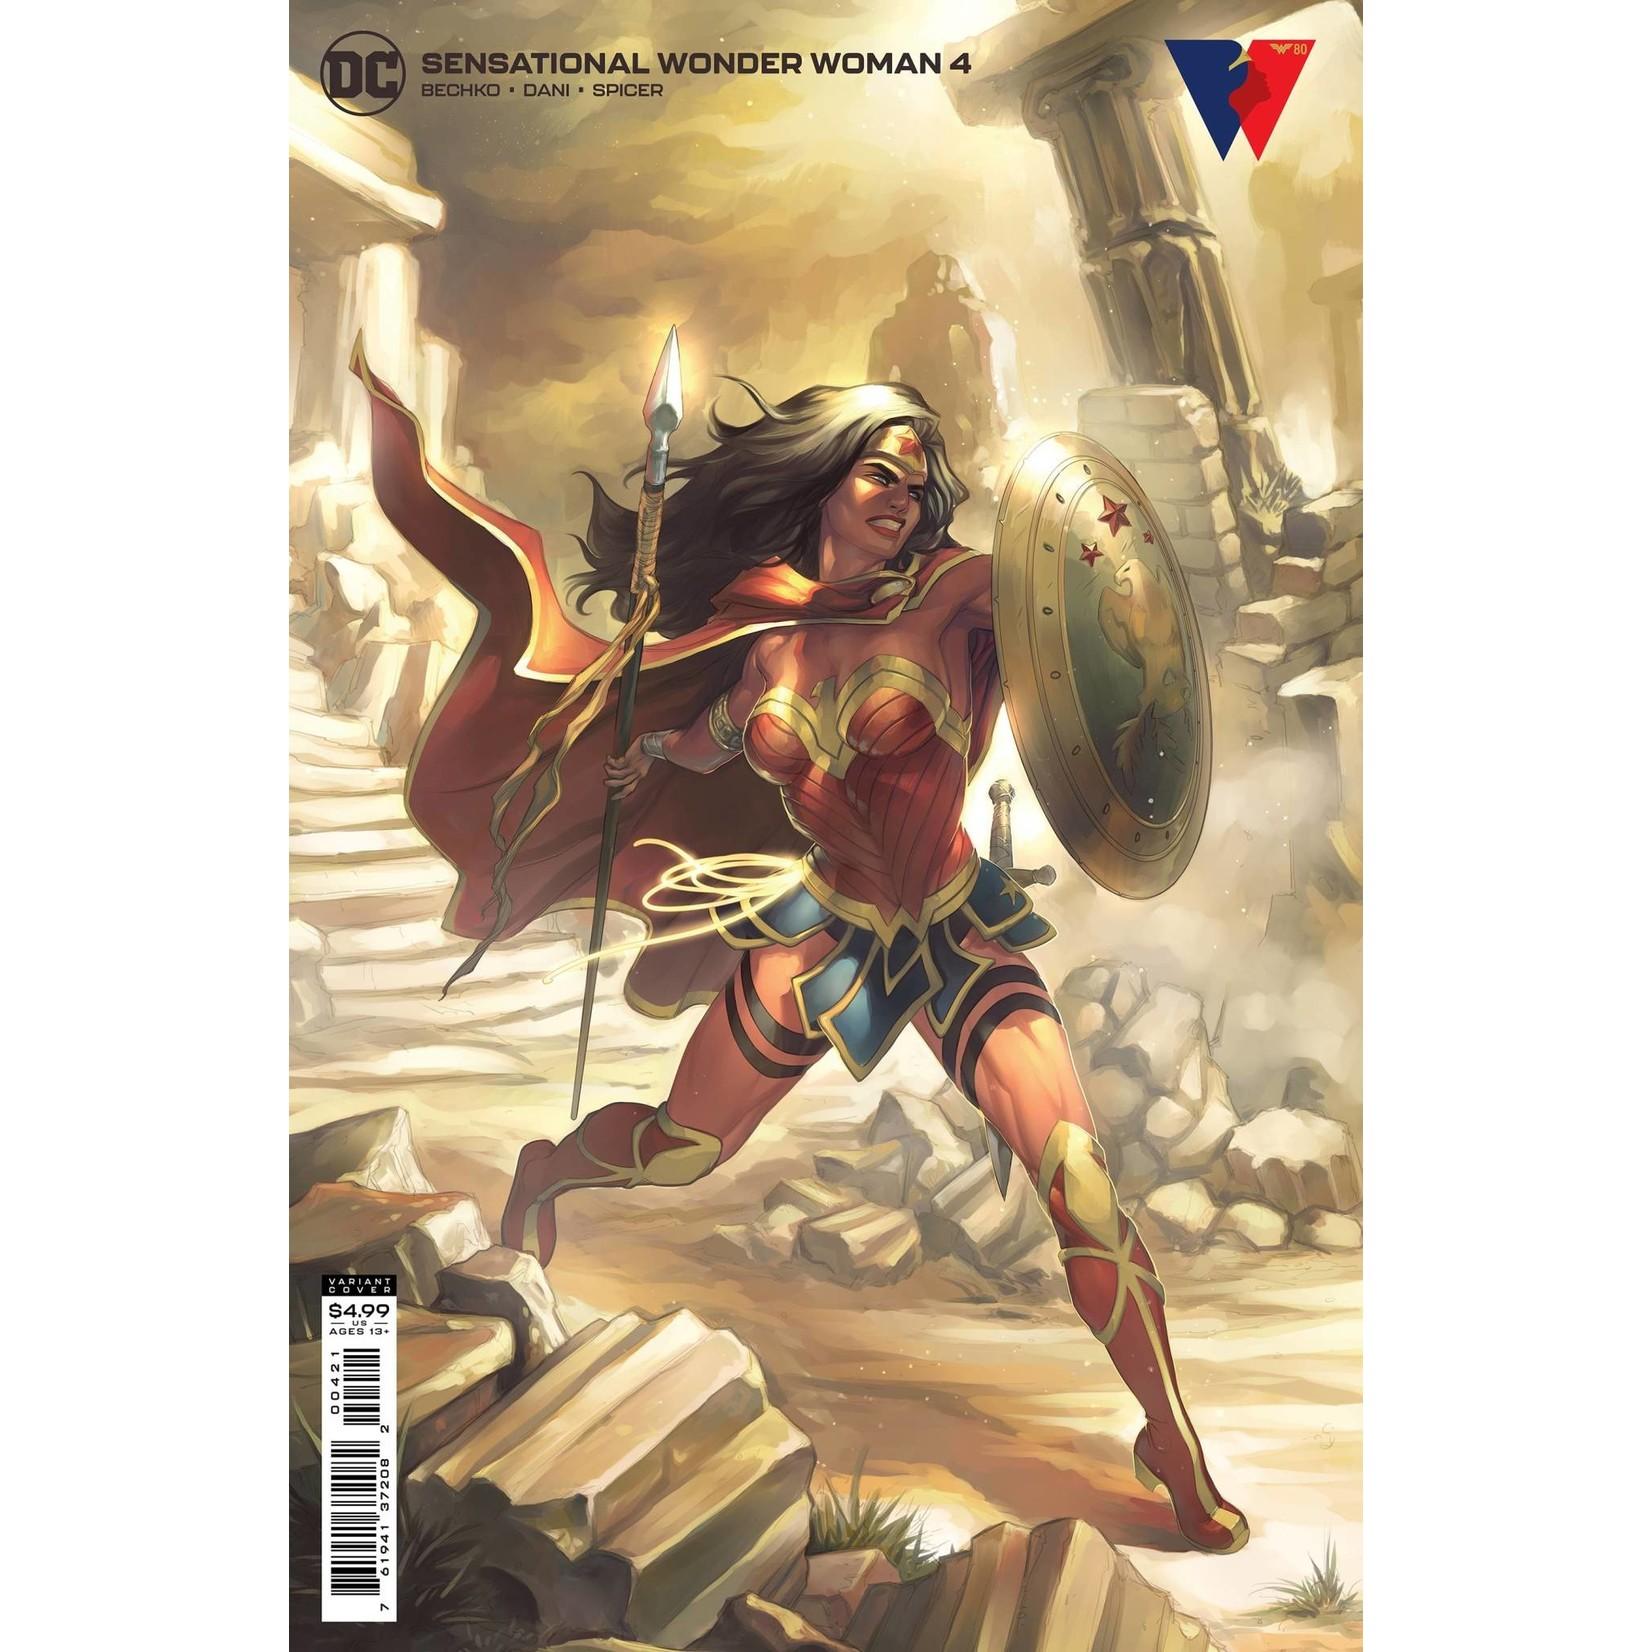 DC Comics SENSATIONAL WONDER WOMAN #4 CVR B MEGHAN HETRICK C